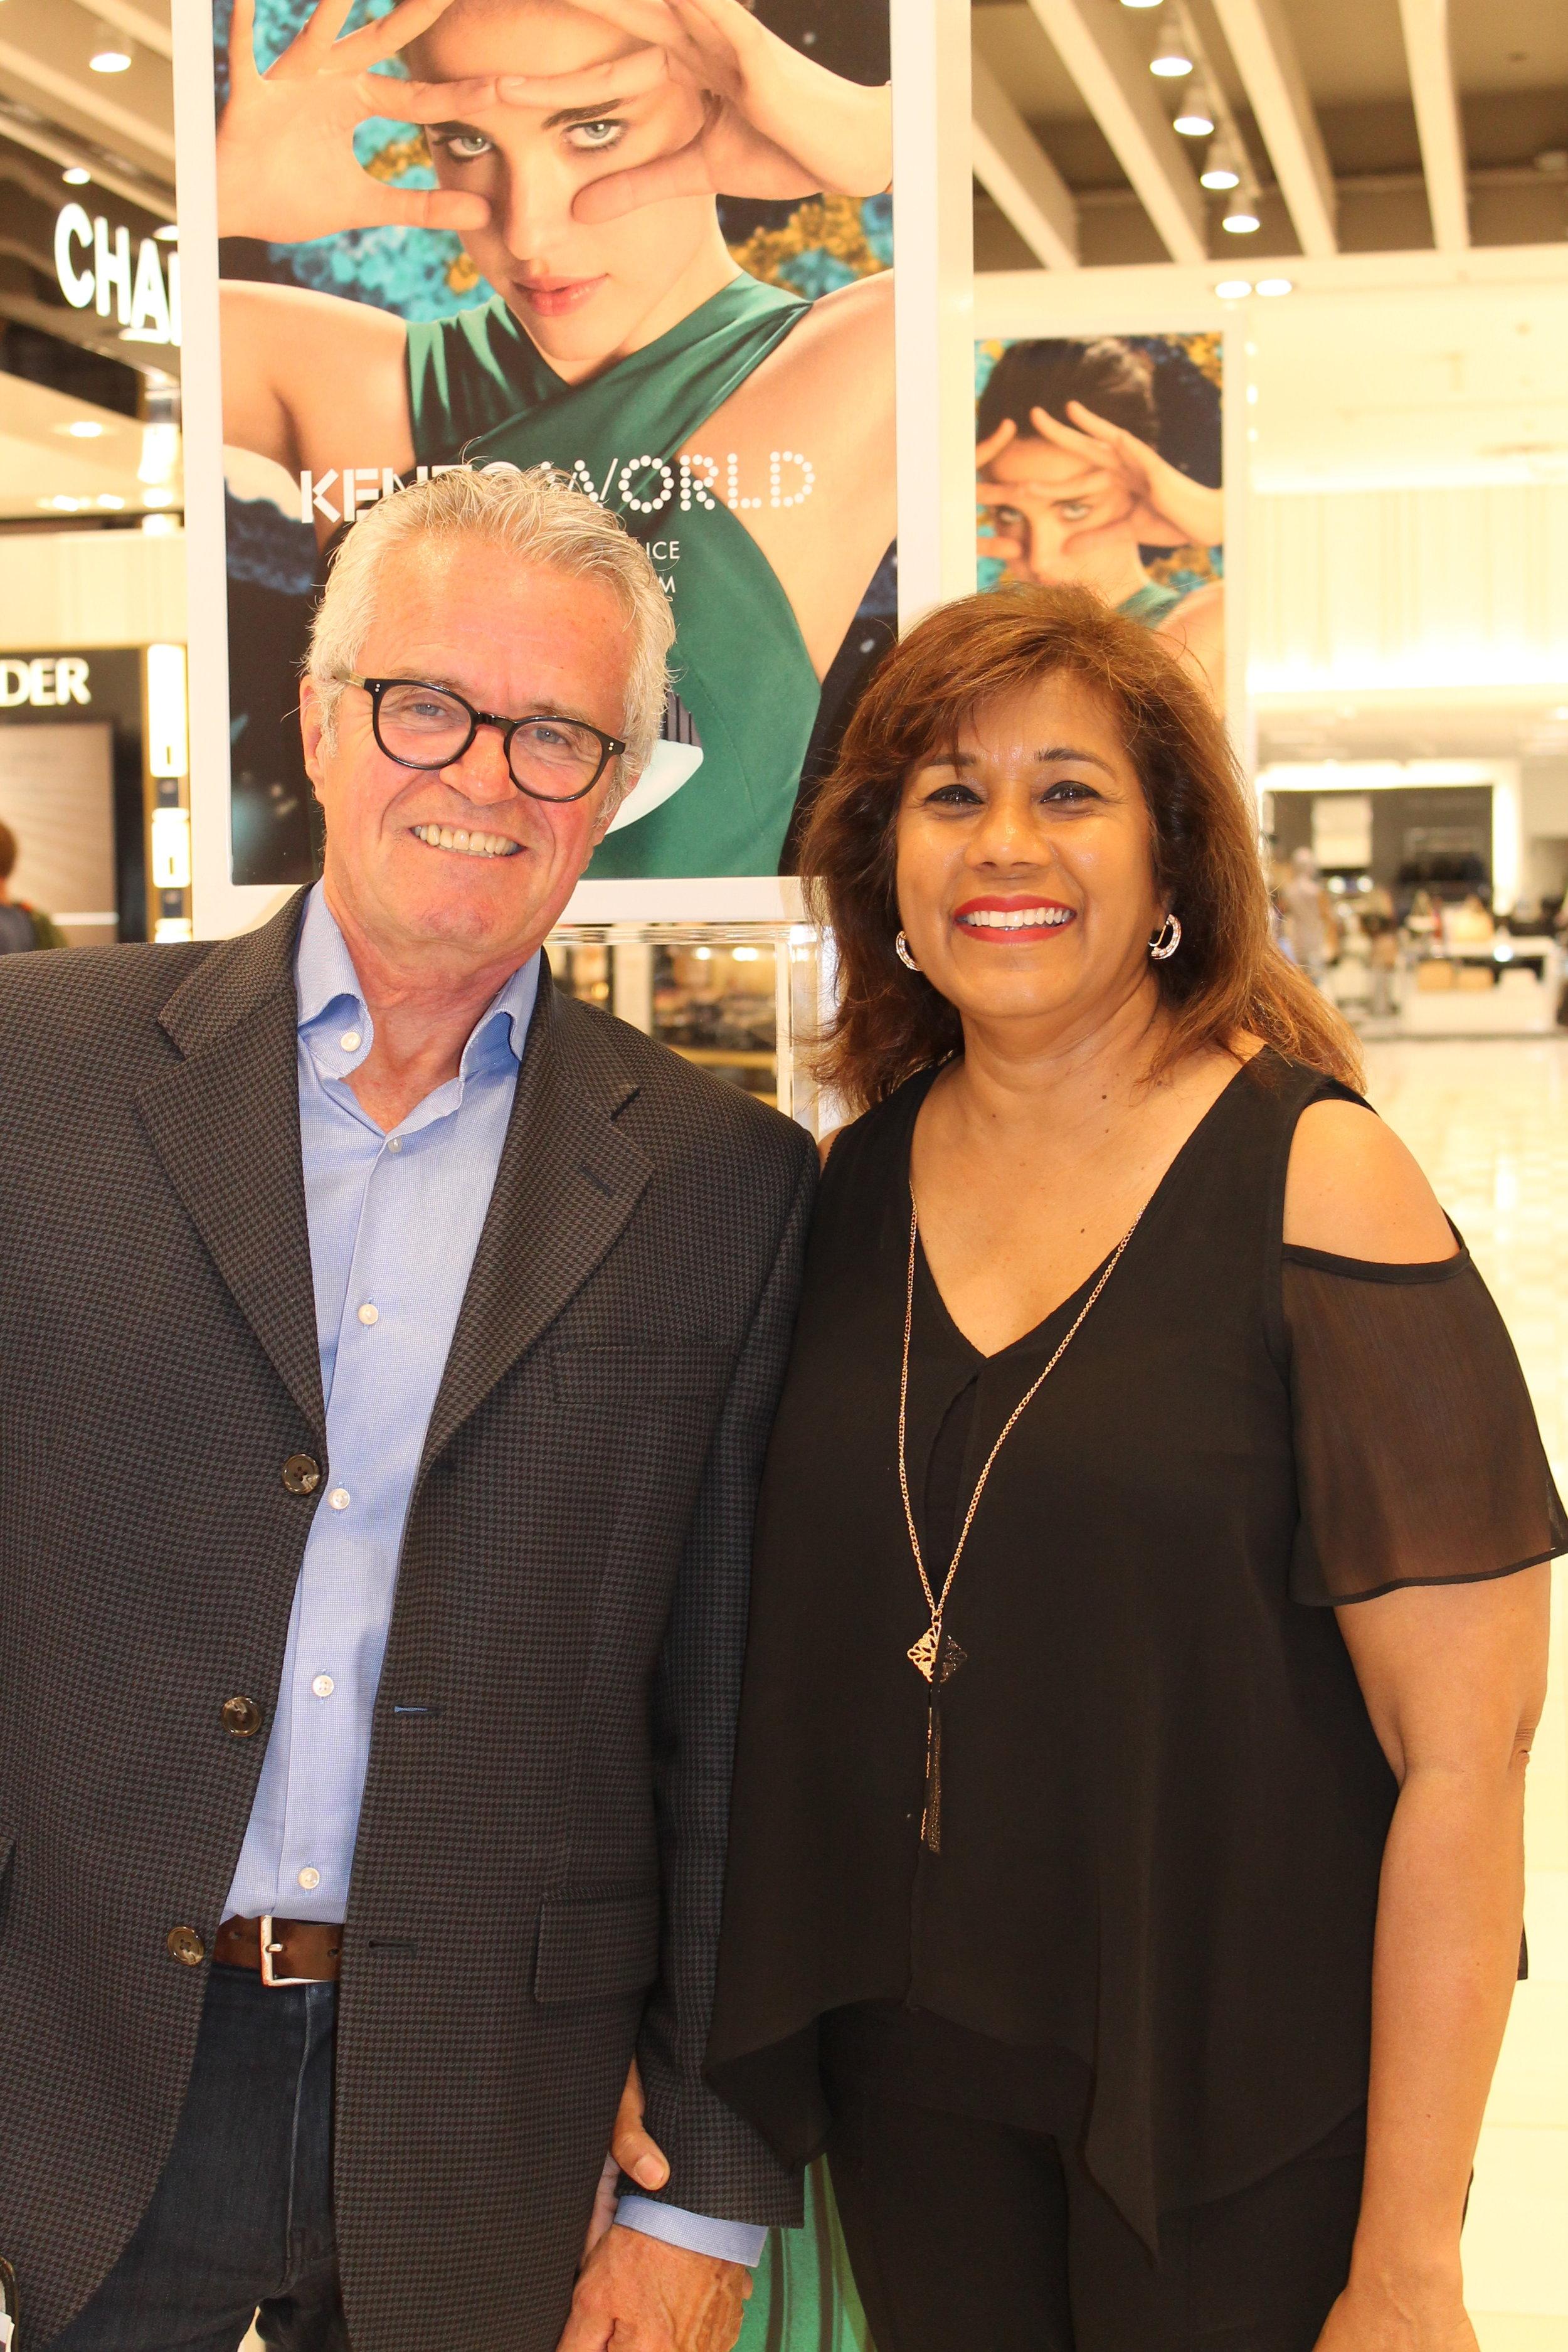 Jim Hicks with previous COSA winner Seeta Samaroo, Givenchy/Kenzo selling specialist at Hudson's Bay Sherway Gardens.